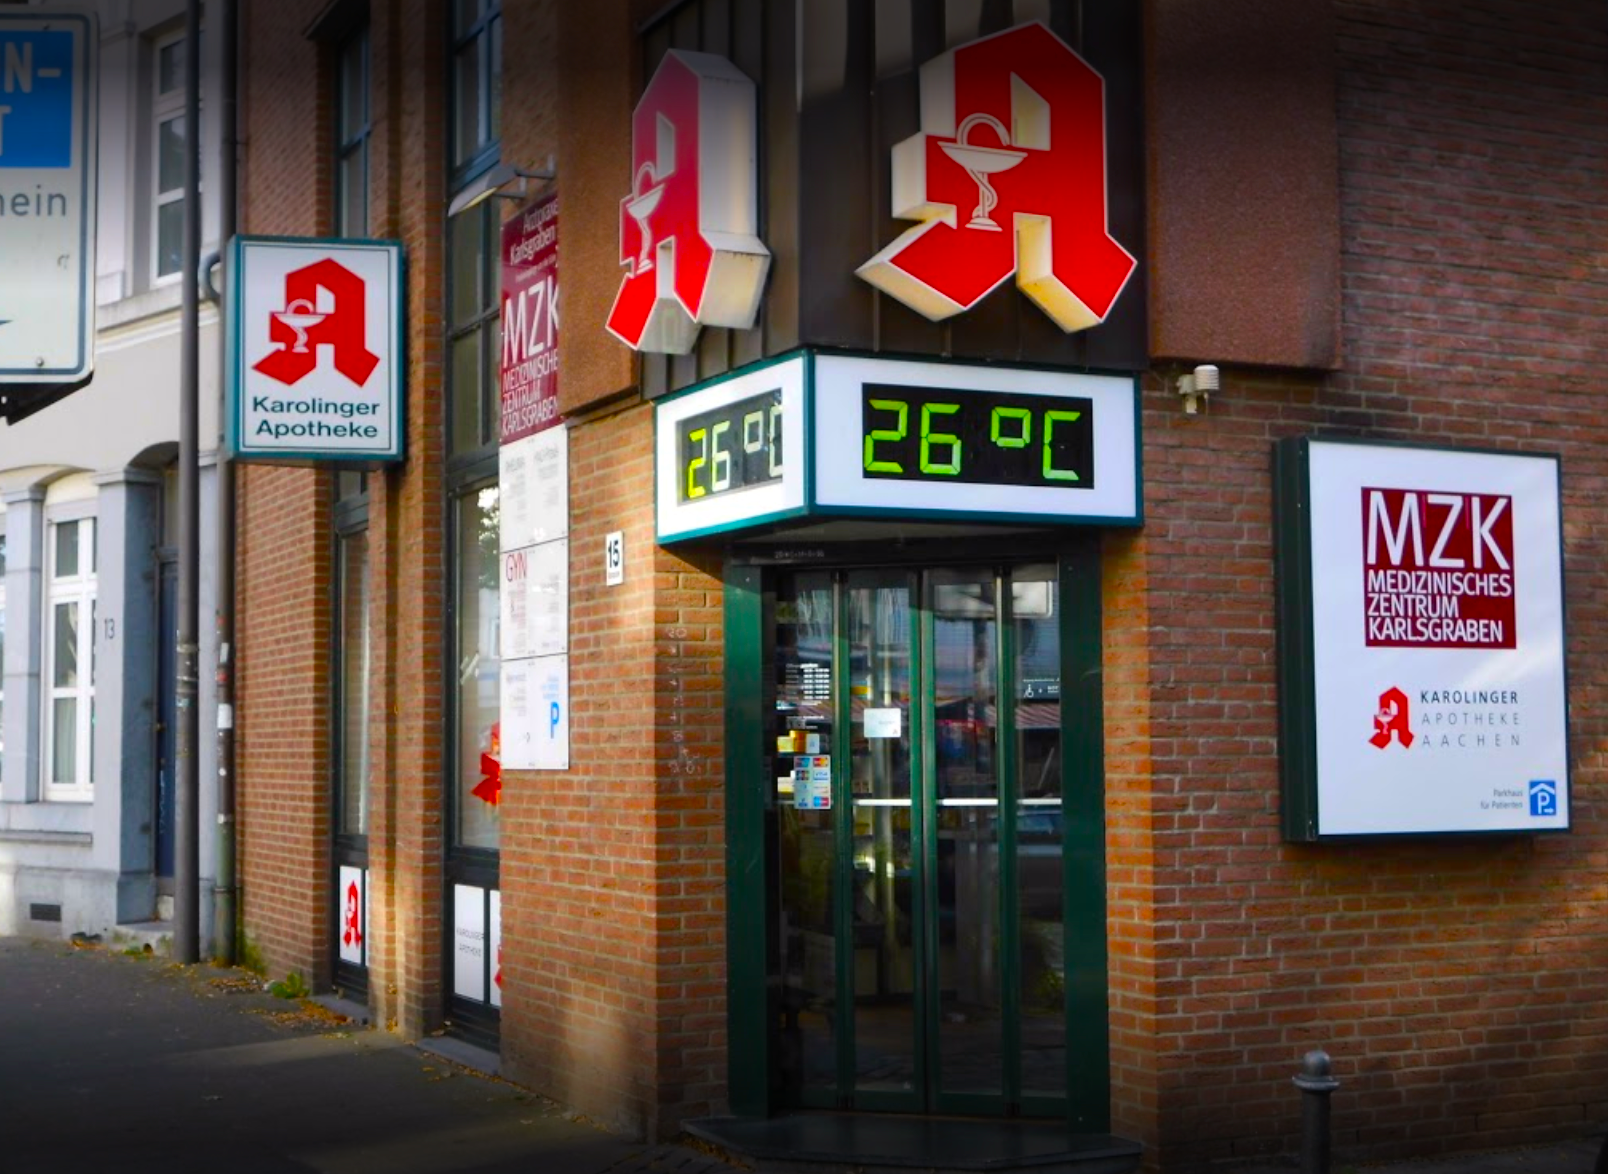 Öffnungszeiten aachen antoniusstraße Lebendiges Aachen